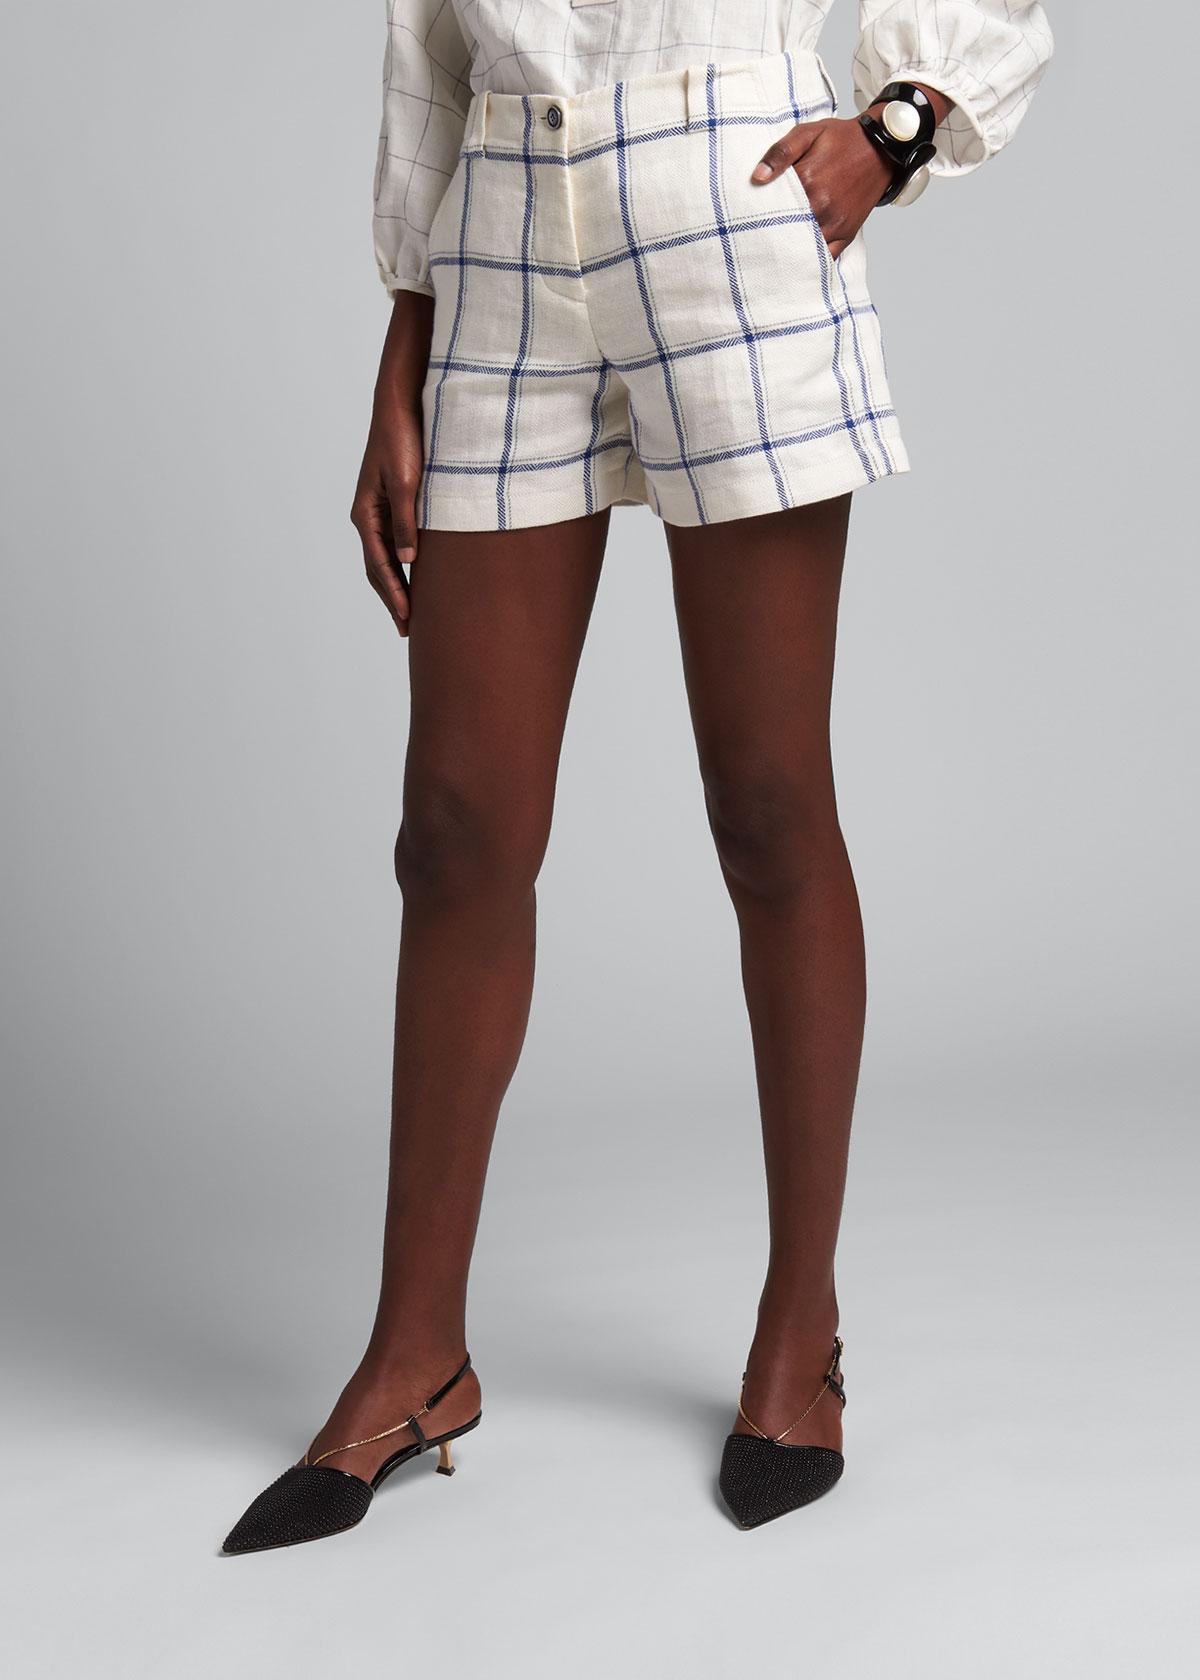 Giorgio Armani Shorts WINDOWPANE CHECK LINEN SHORTS